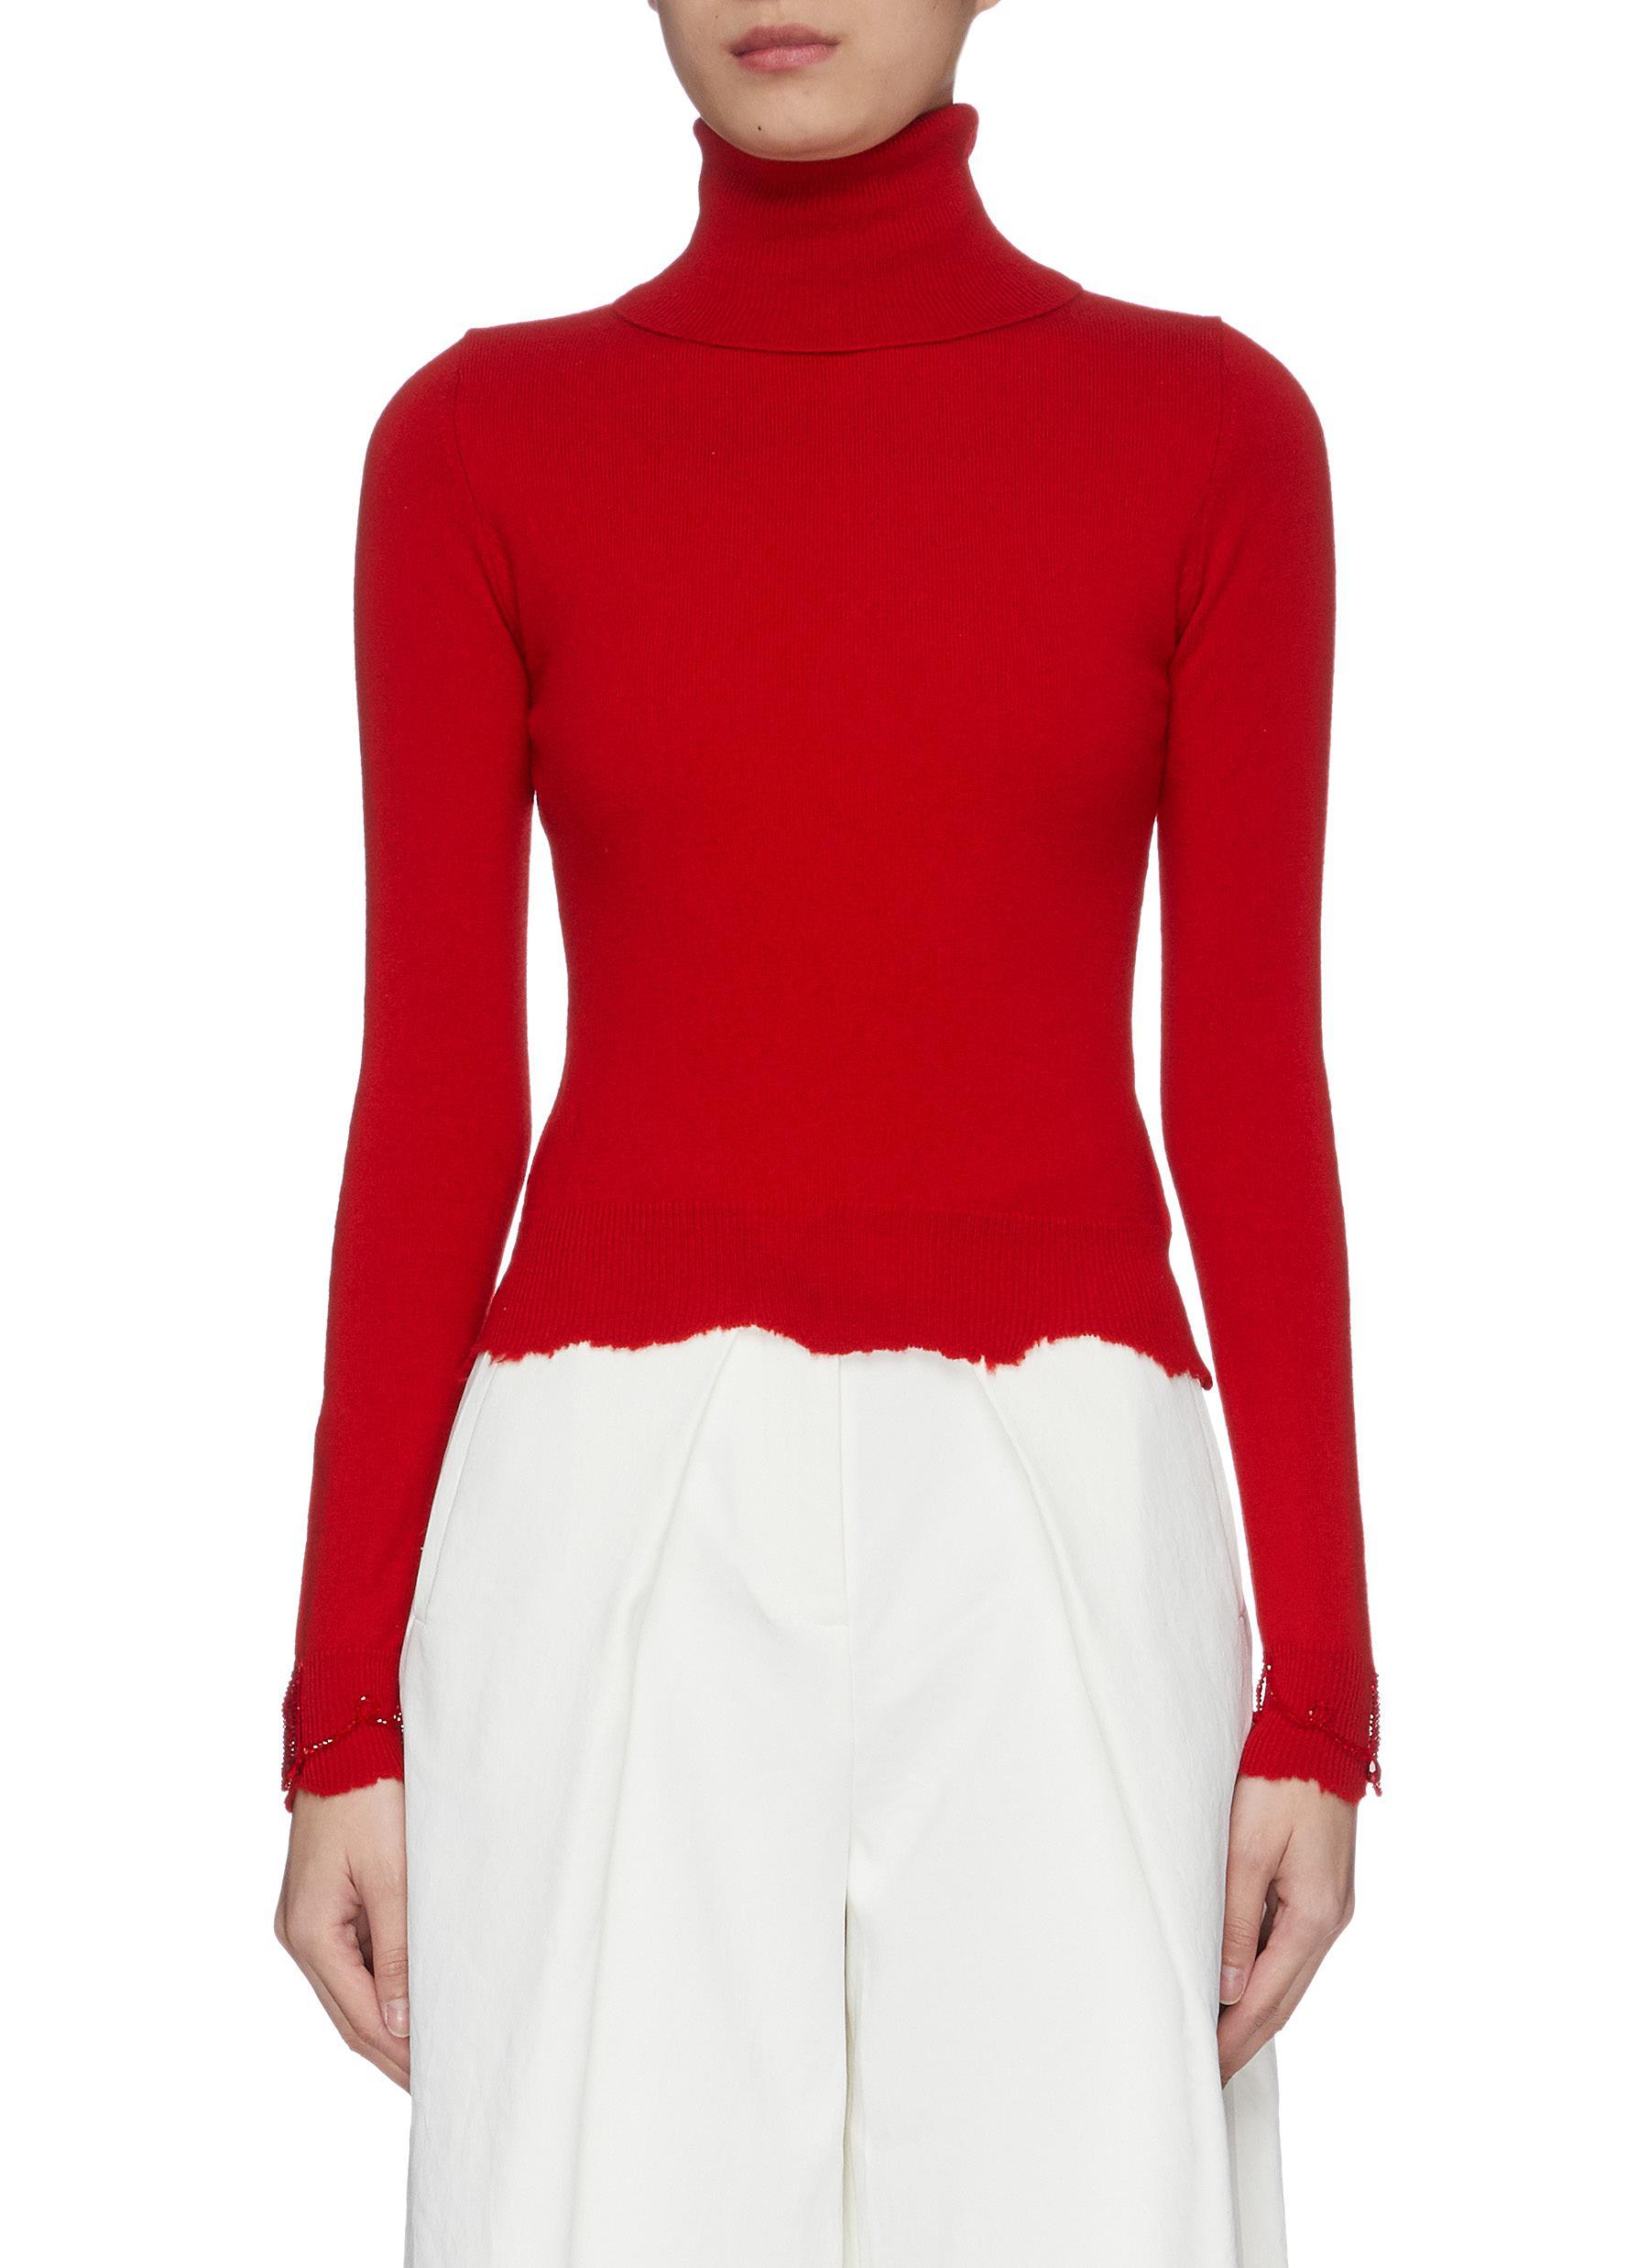 Bead embellished distressed trim turtleneck sweater by Shushu/Tong